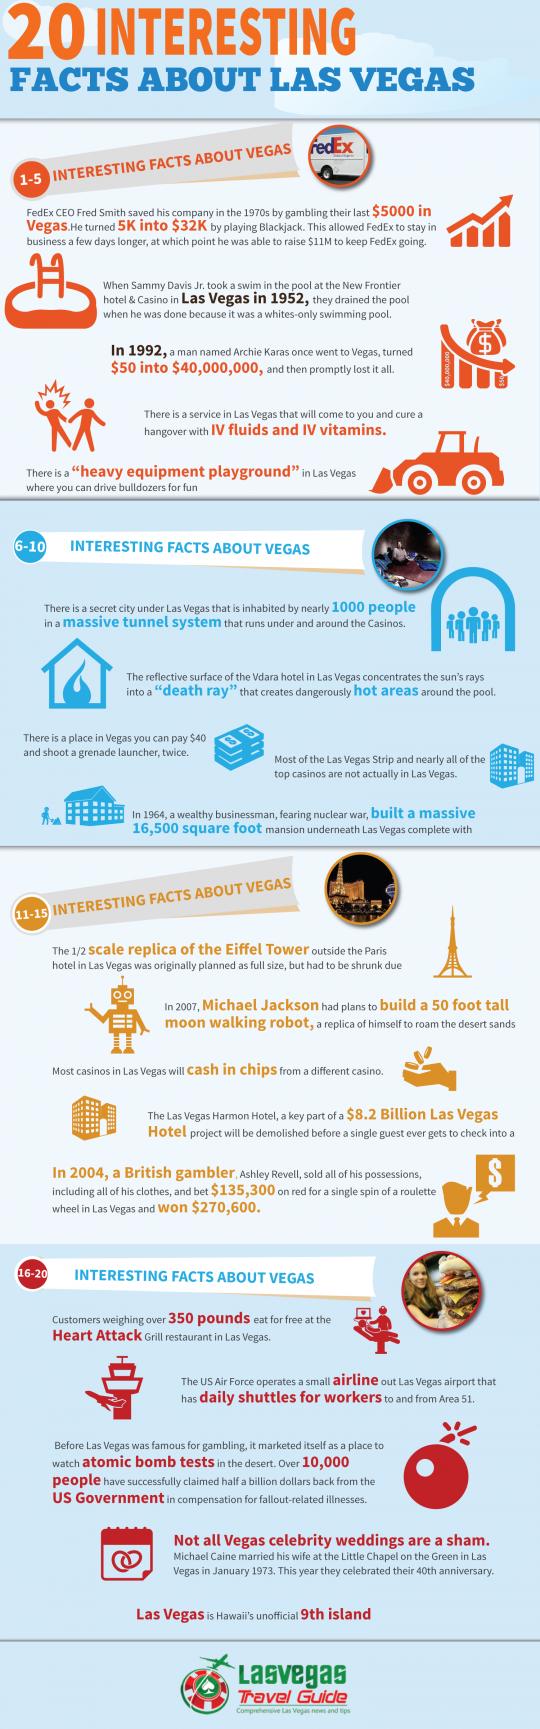 20 Interesting facts about Las Vegas